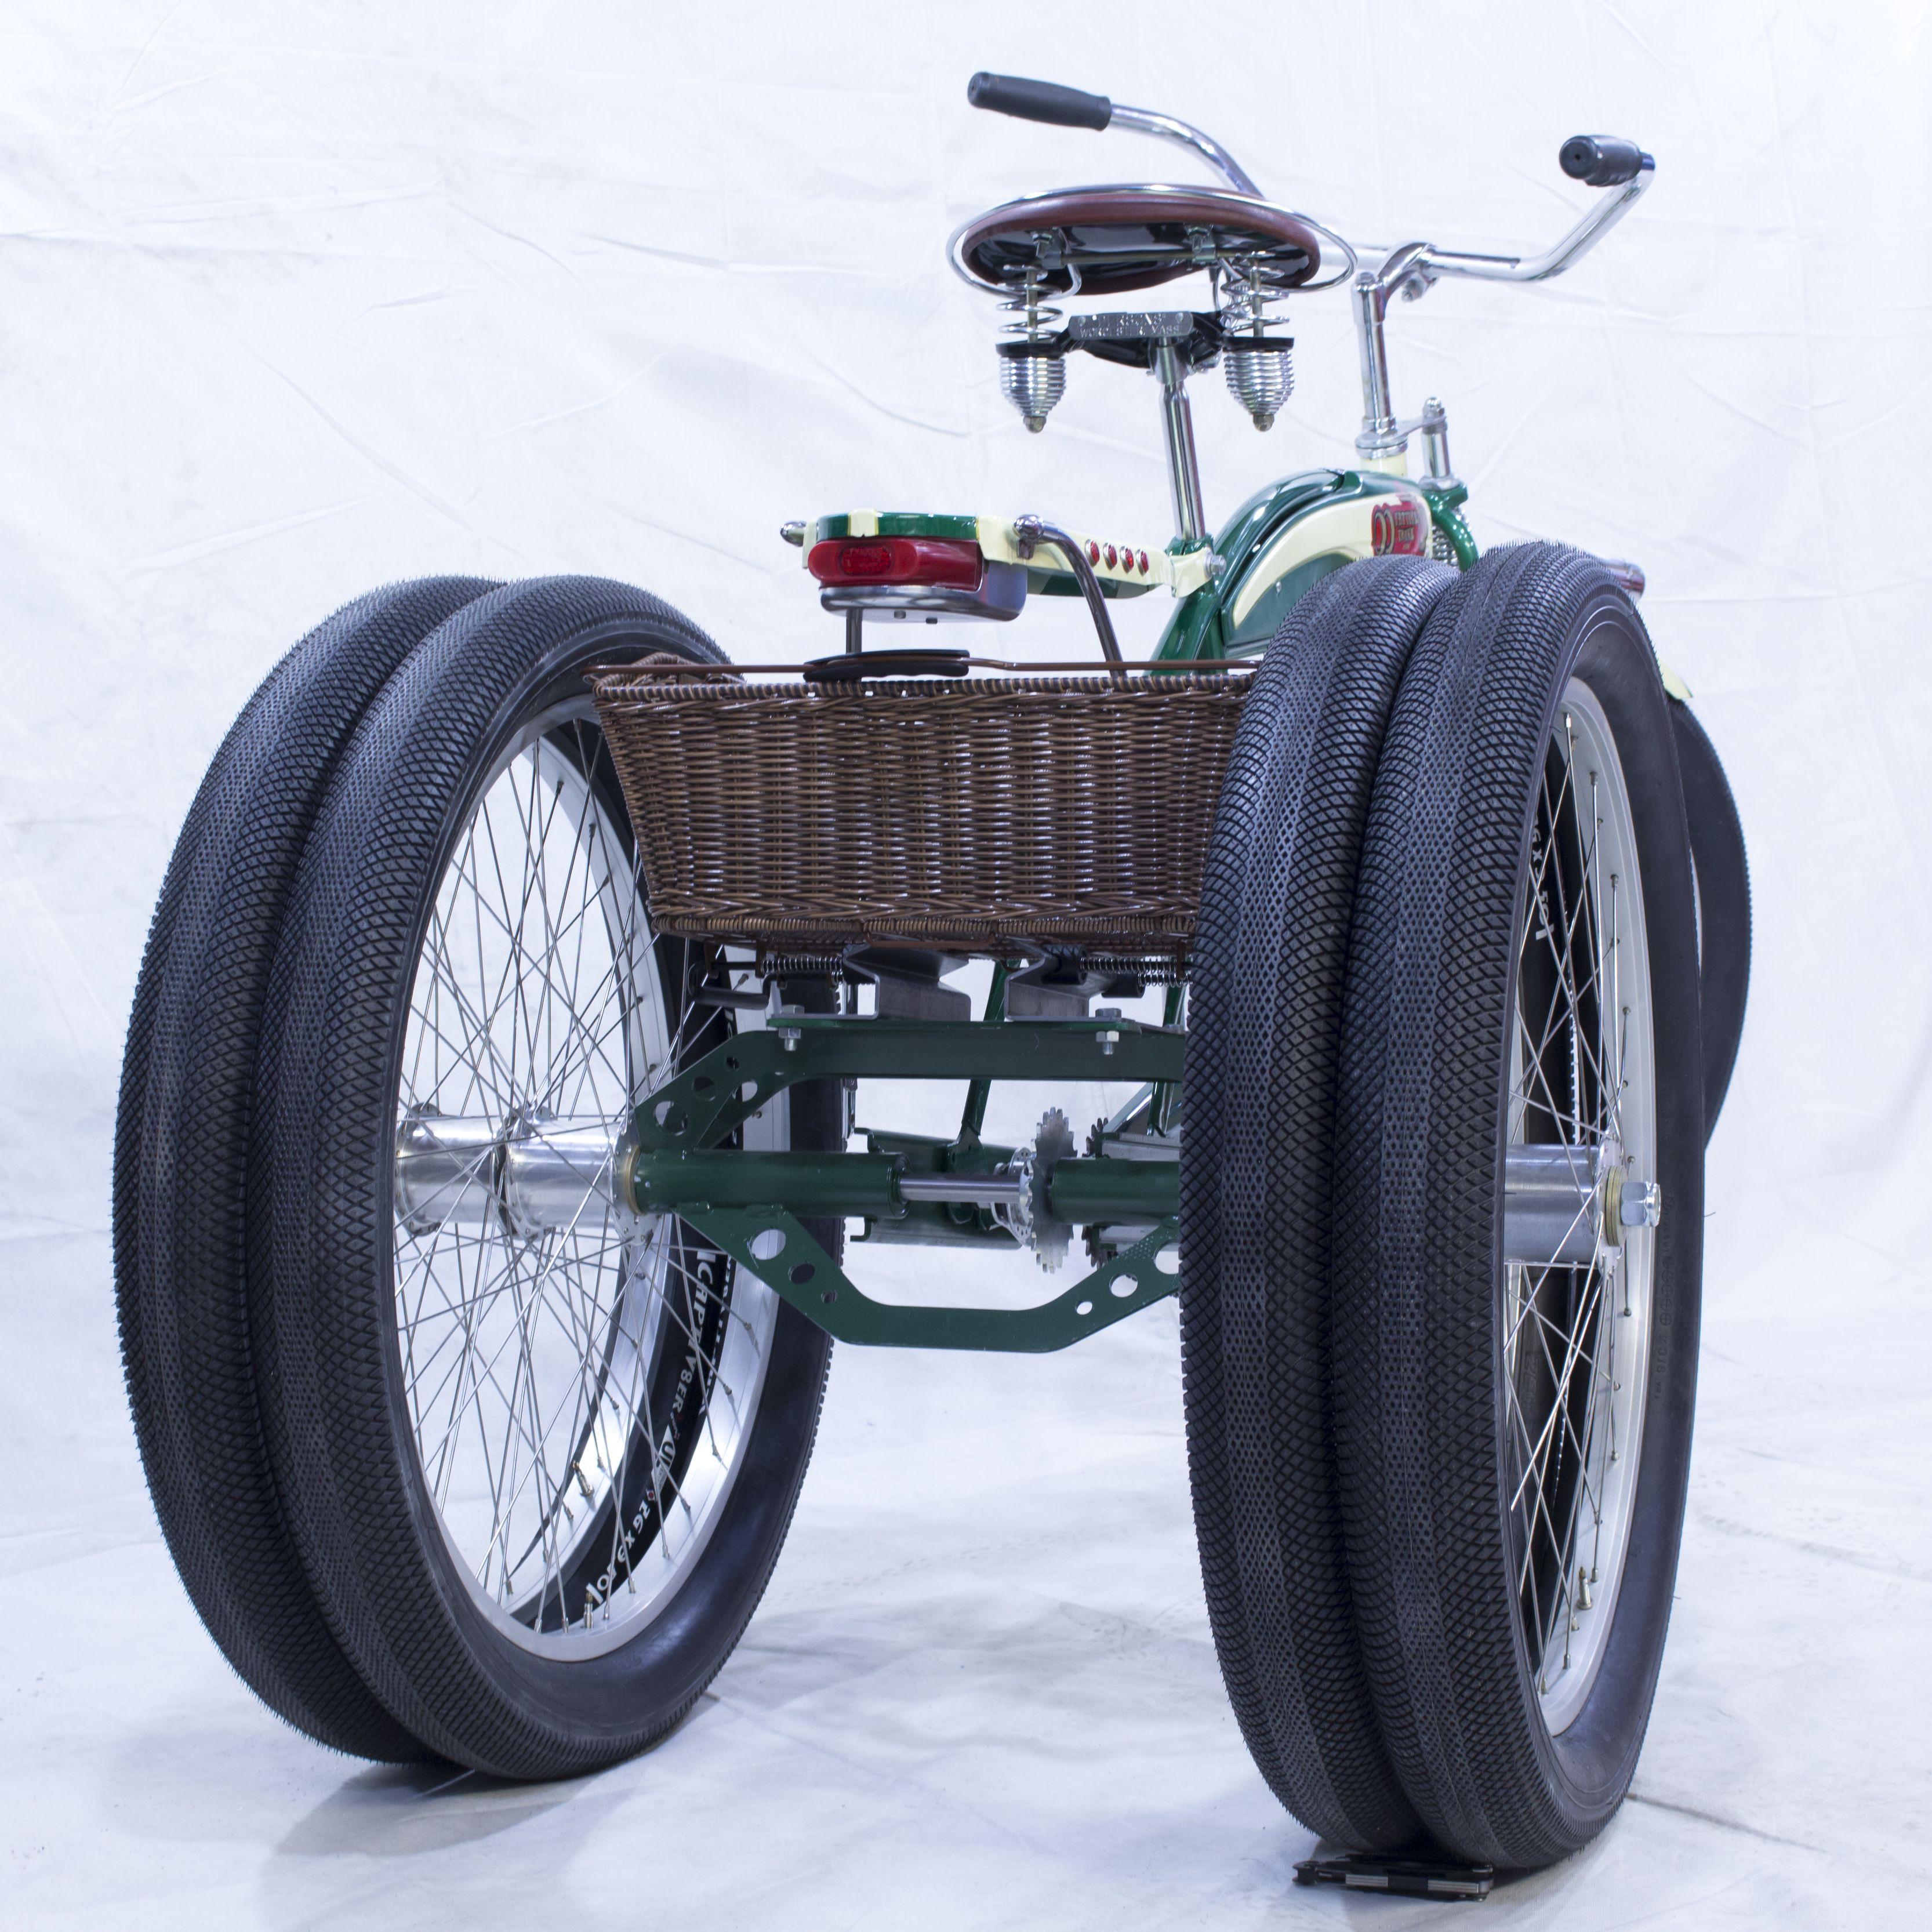 Beach Cruiser Fat Tire Trike Fatbike Vintage Custom